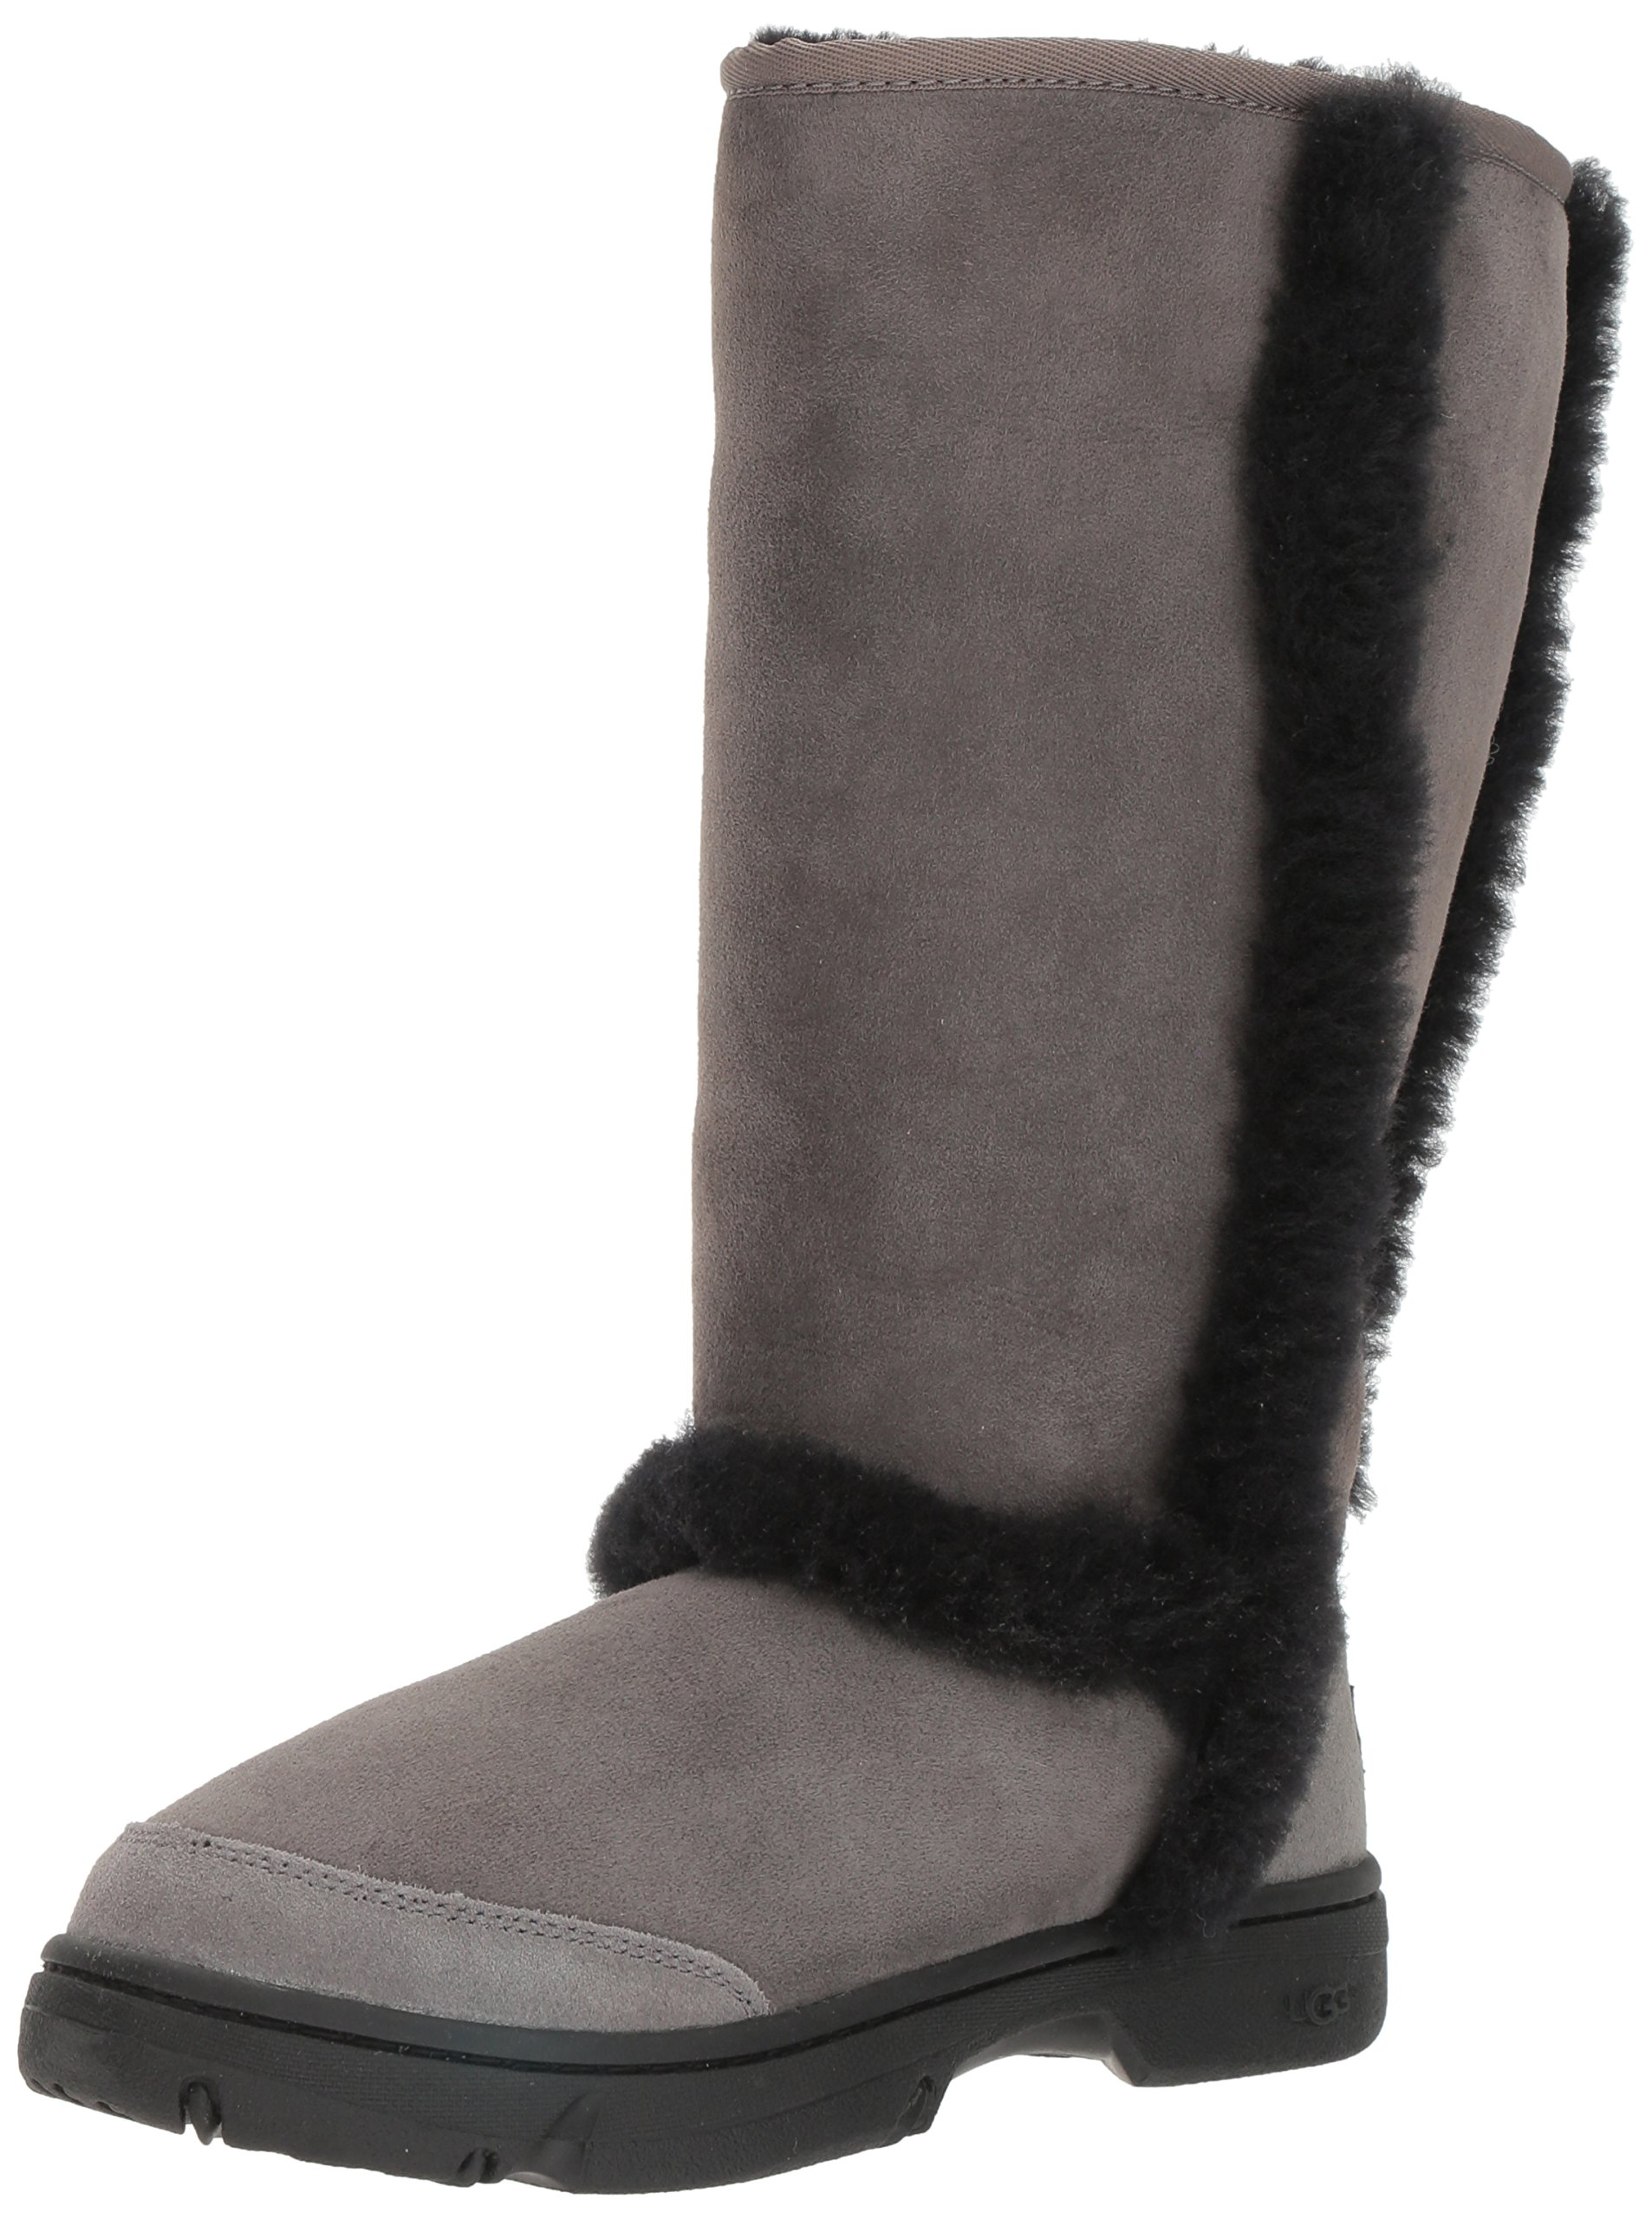 UGG Women's Sunburst Tall Fashion Sneaker, Grey/Black, 7 M US